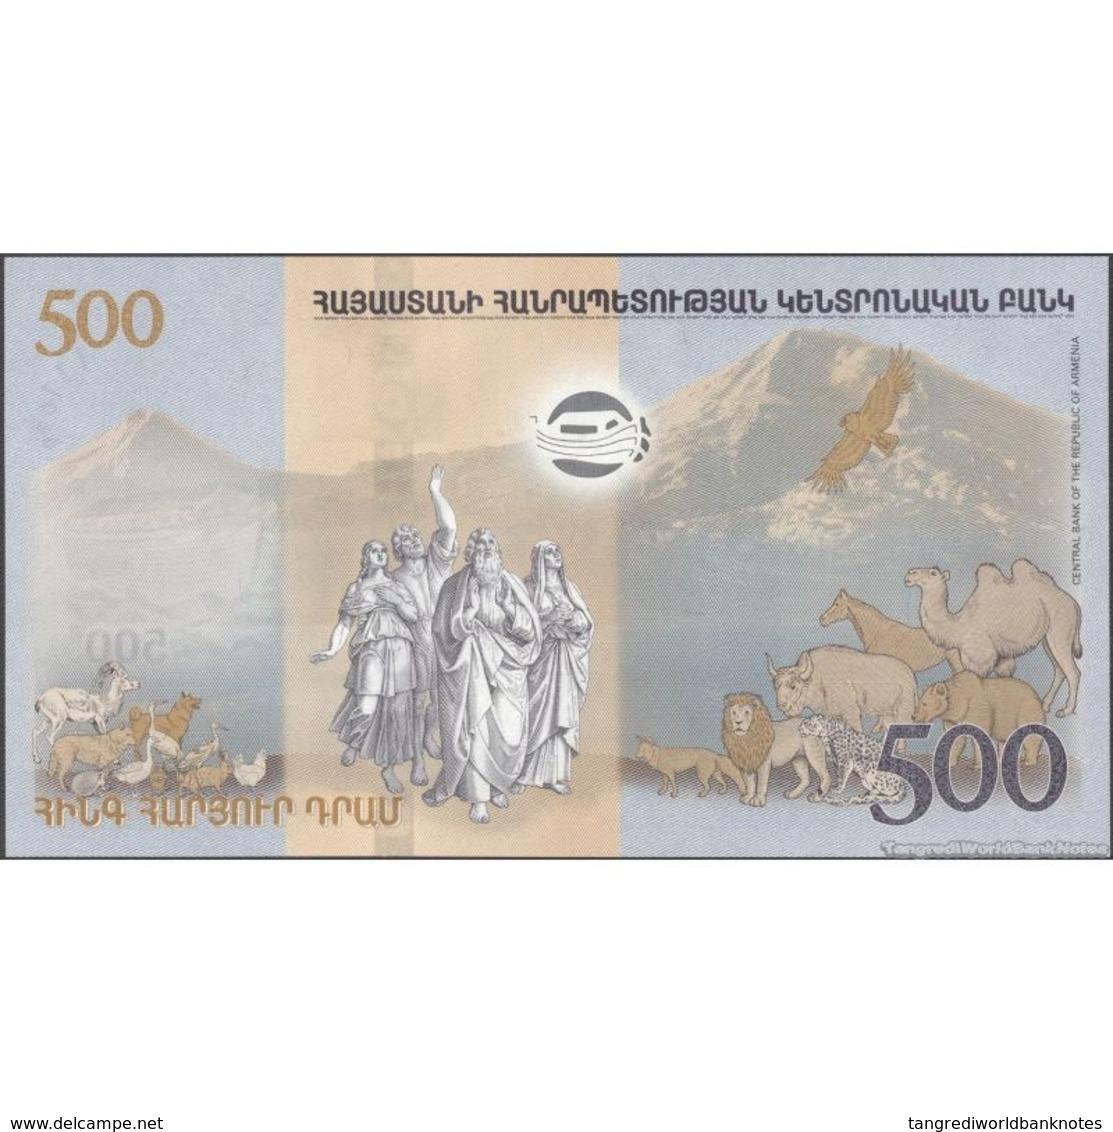 TWN - ARMENIA 60 - 500 Dram 2017 Hybrid - Noah's Ark UNC - Armenia